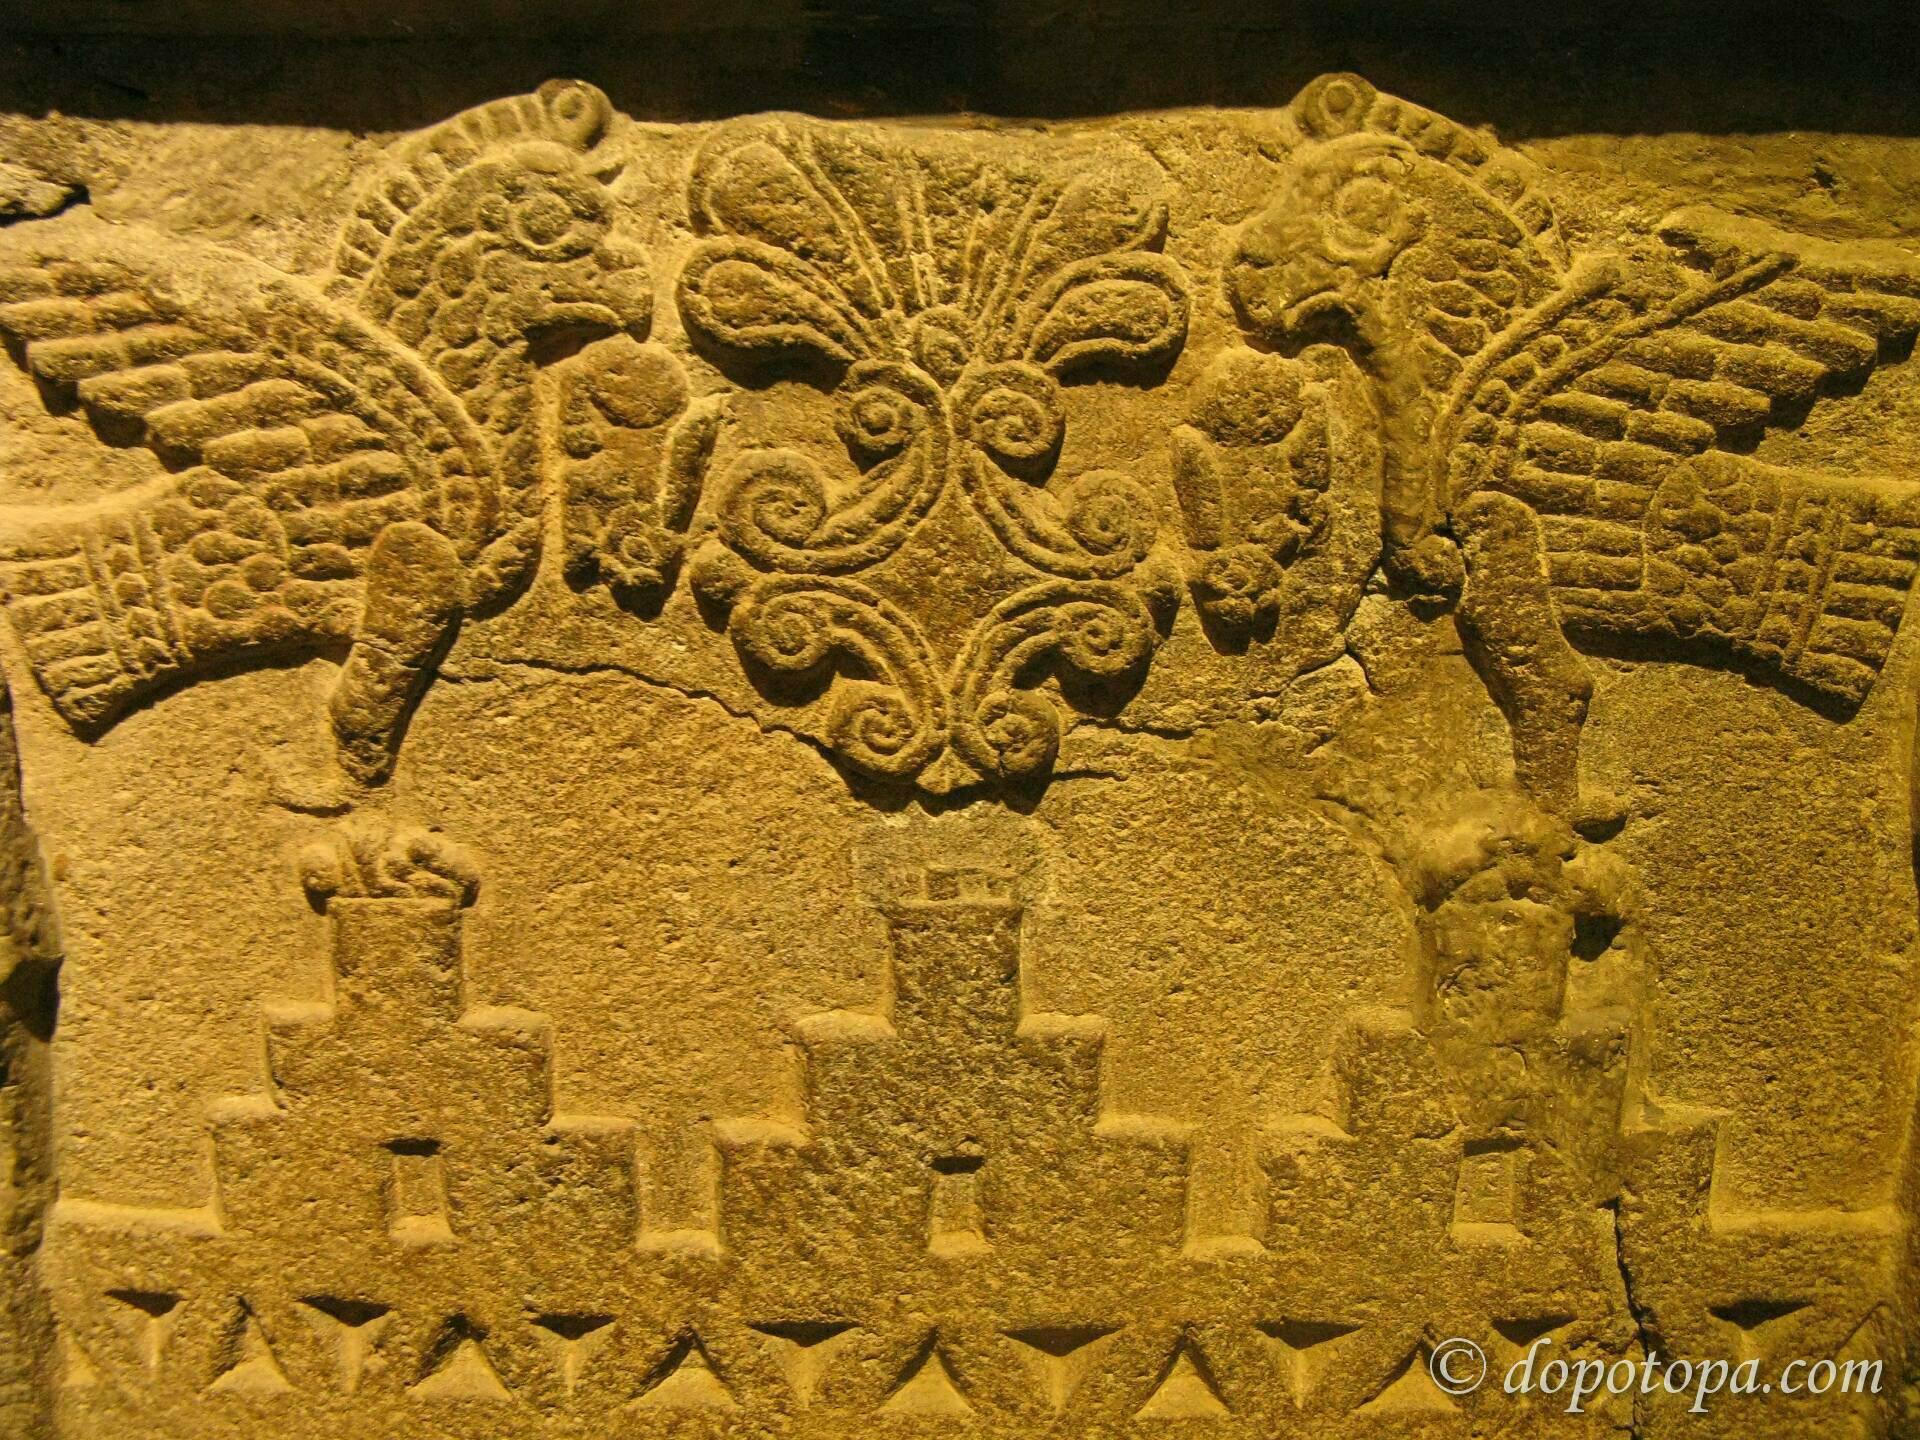 ankara_museum_stone_artefacts_56.JPG